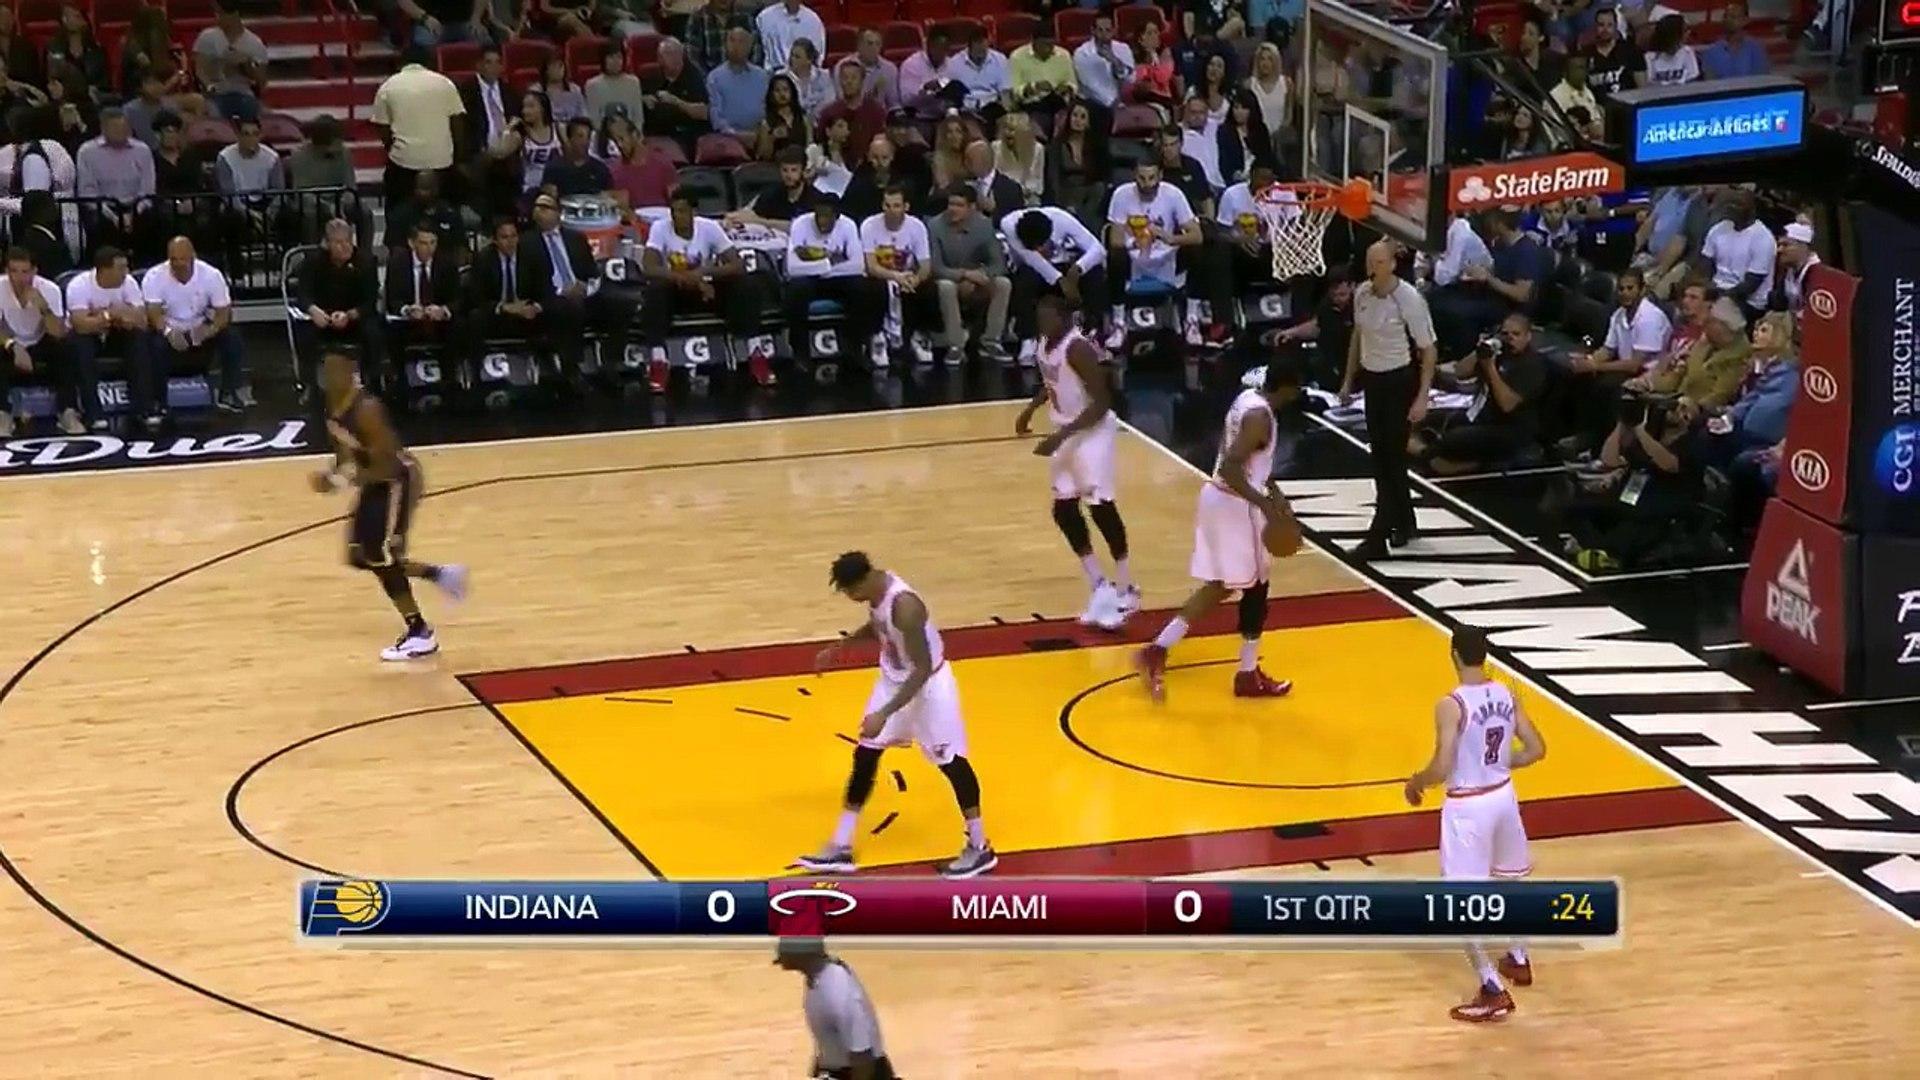 NBA RECAP Pacers with 11-0 Run | Pacers vs Heat | February 22, 2016 | NBA 2015-16 Season